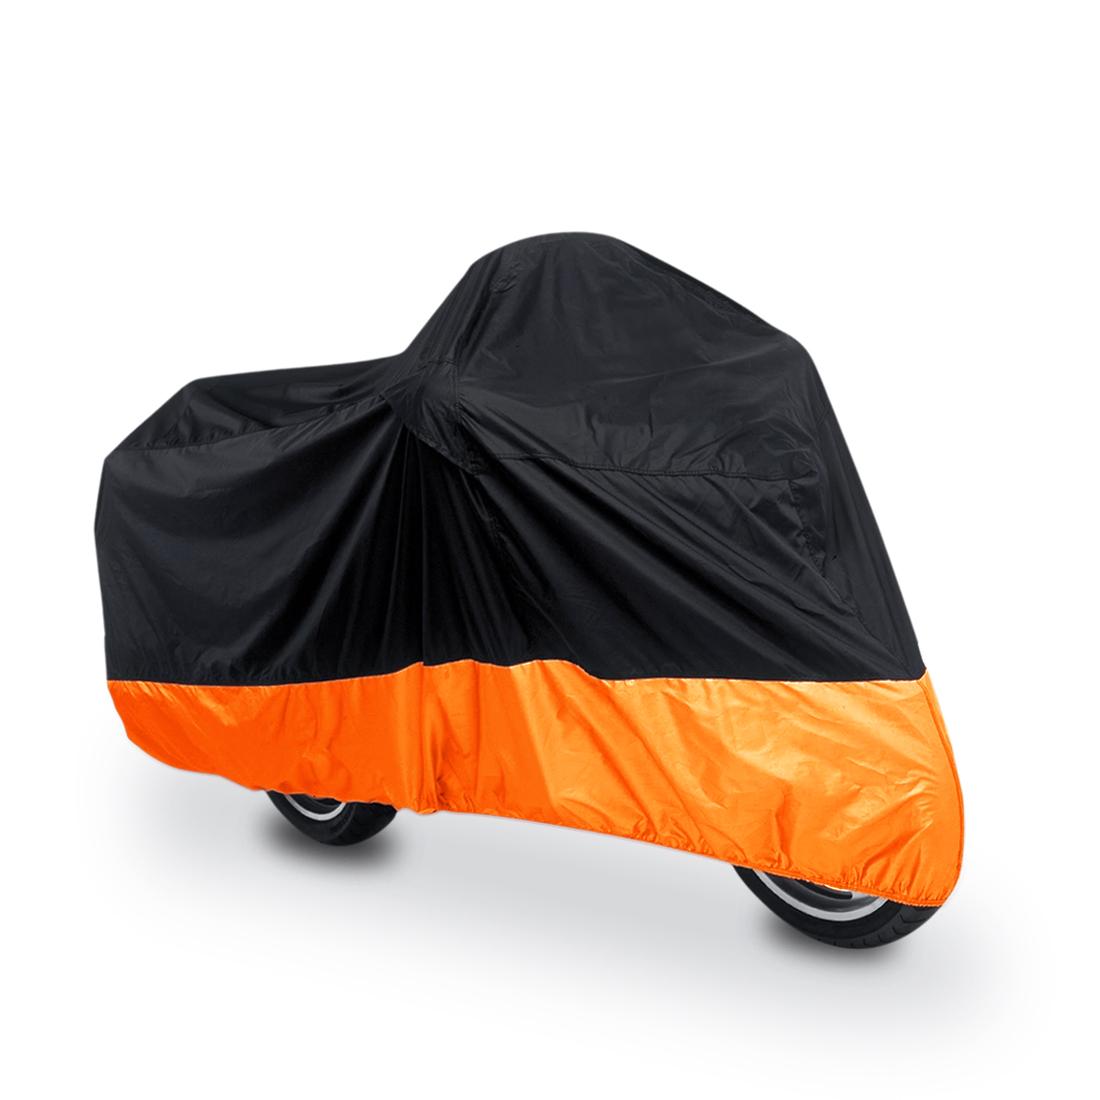 Black+Orange Motorcycle Cover For Harley Davidson Heritage Softail Classic FLSTC